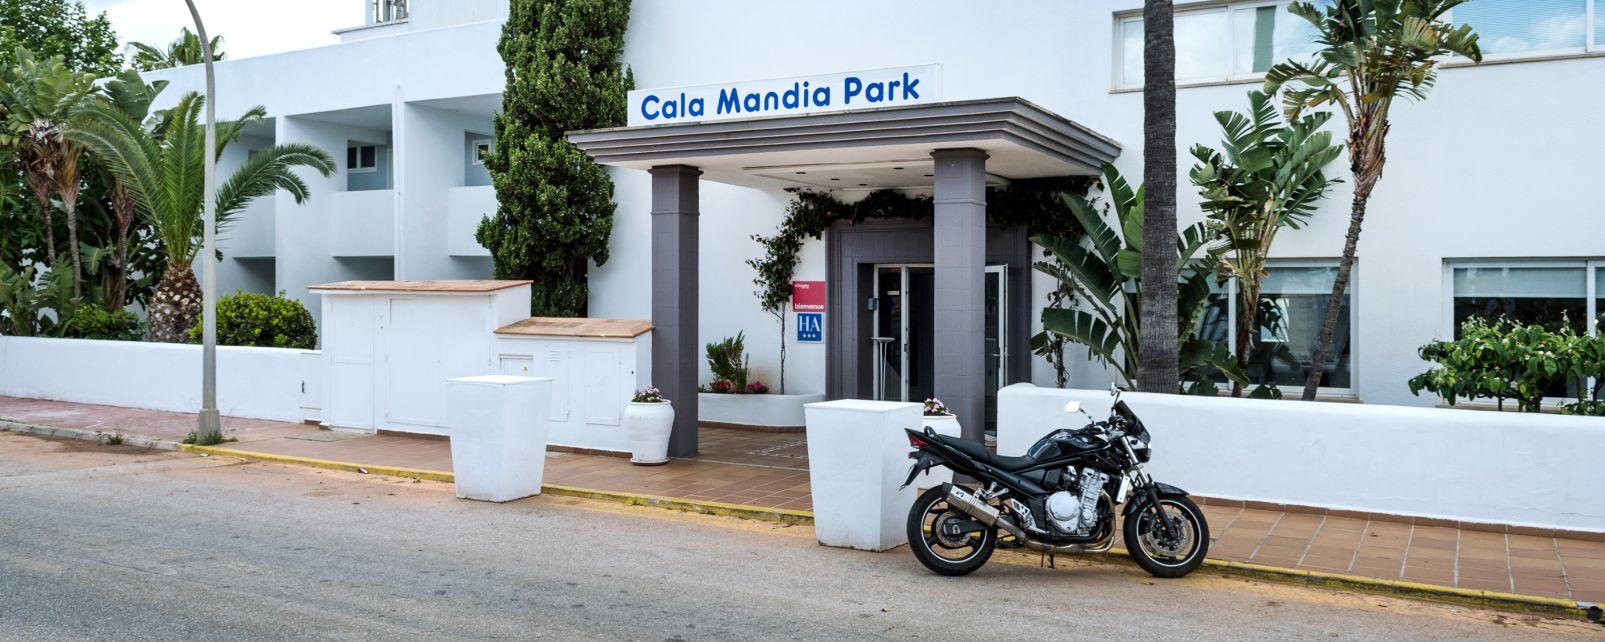 Hotel Cala Mandia Park